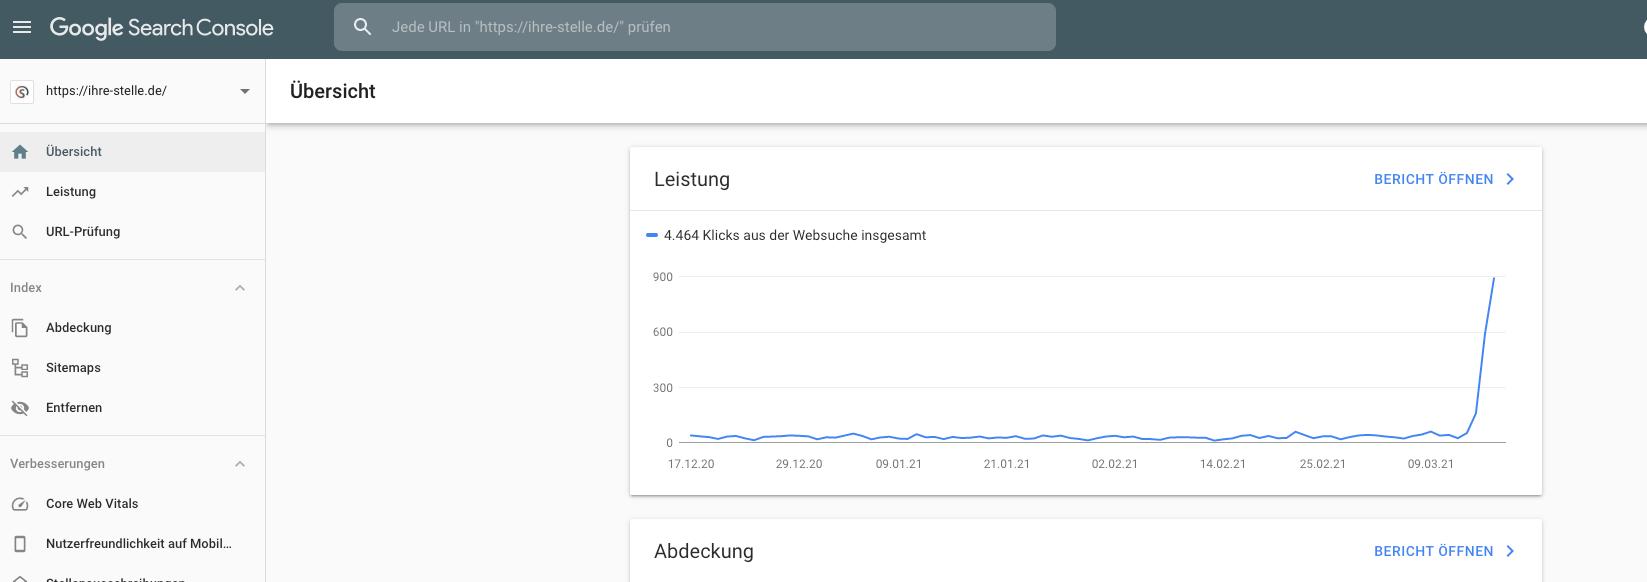 Google-Search-Console-SEO-Leistung-top